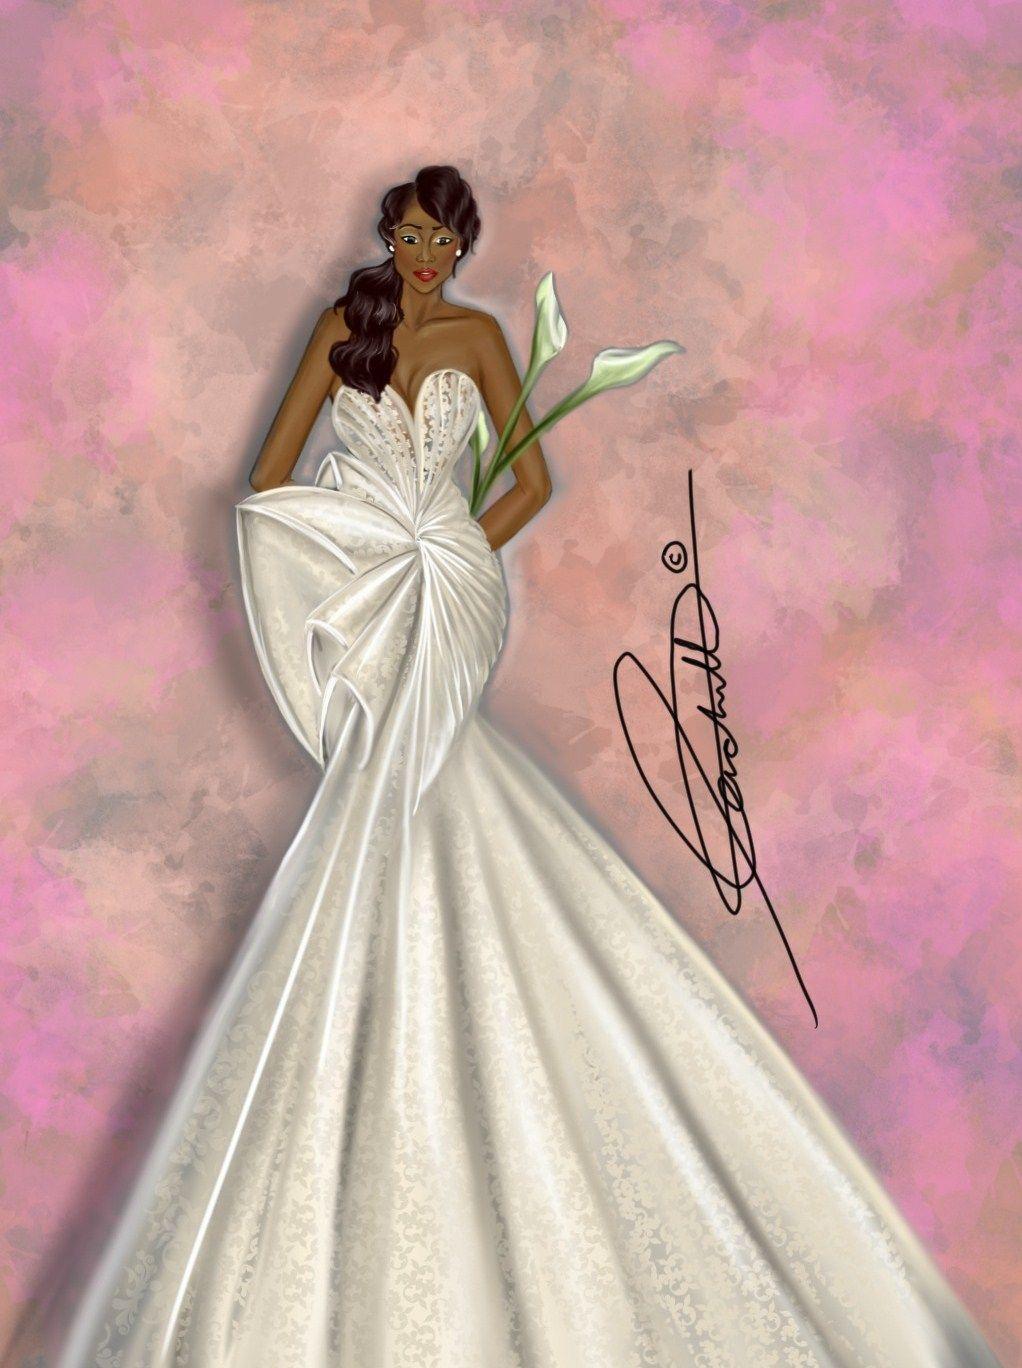 Peniel Enchill Illustrates | wedding | Pinterest | Bocetos y Novios